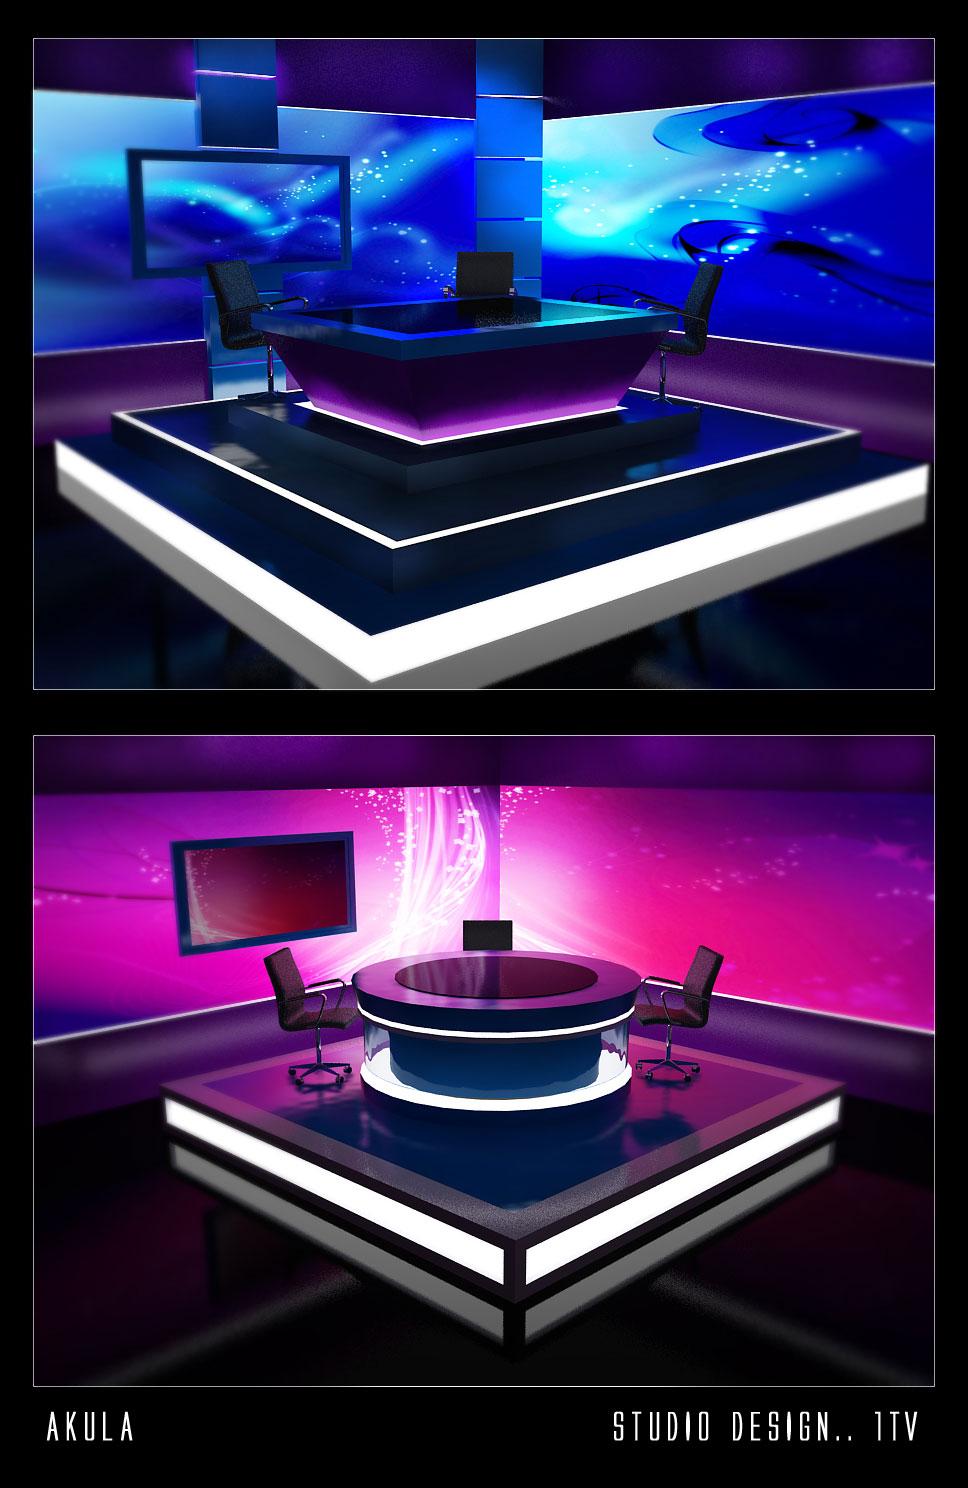 Studio design 1 tv by akula13 on deviantart for The design studio